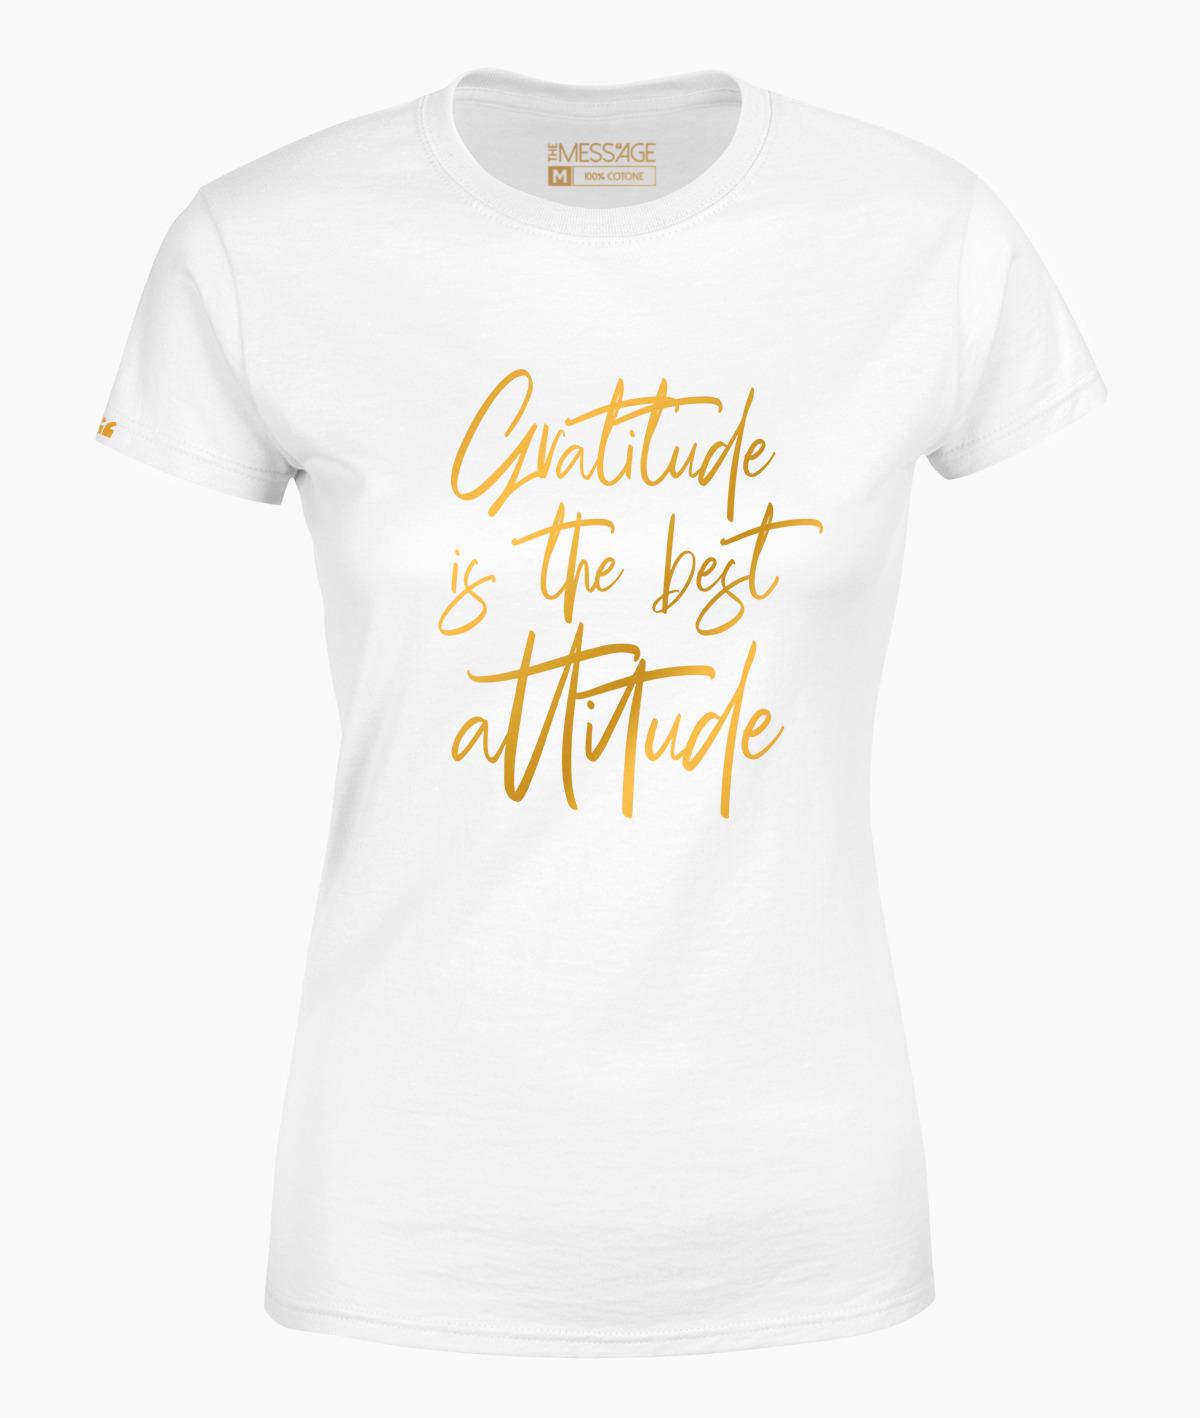 Gratitude is the best attitude T-Shirt